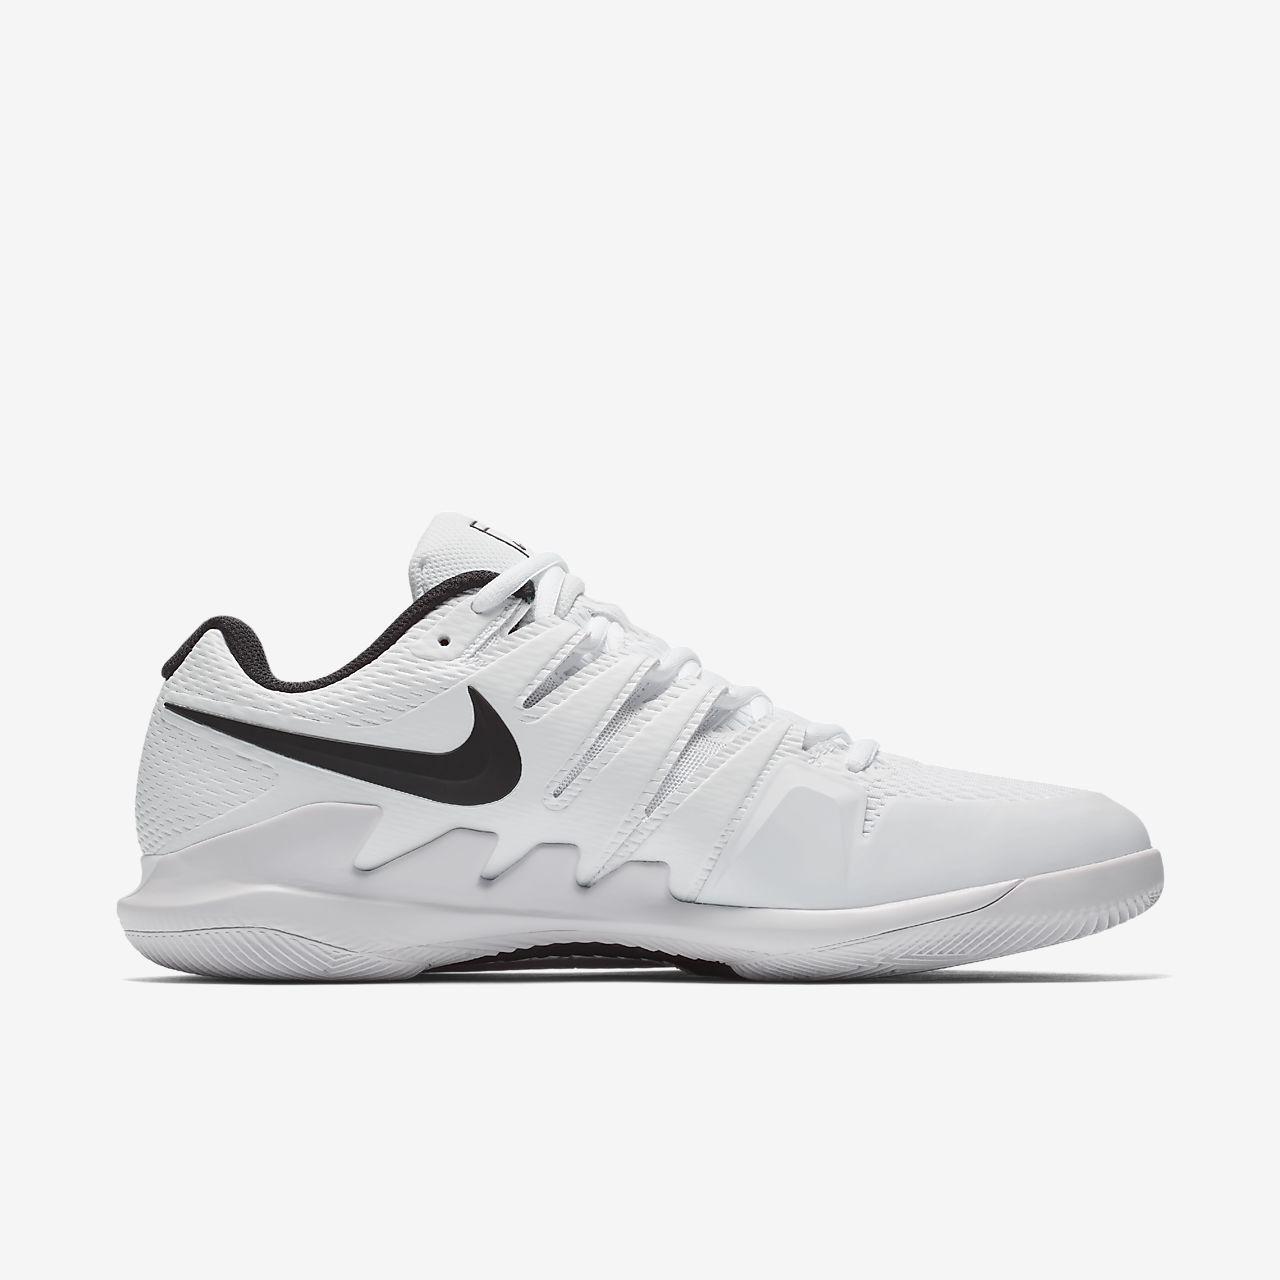 ... Nike Air Zoom Vapor X HC Herren-Tennisschuh